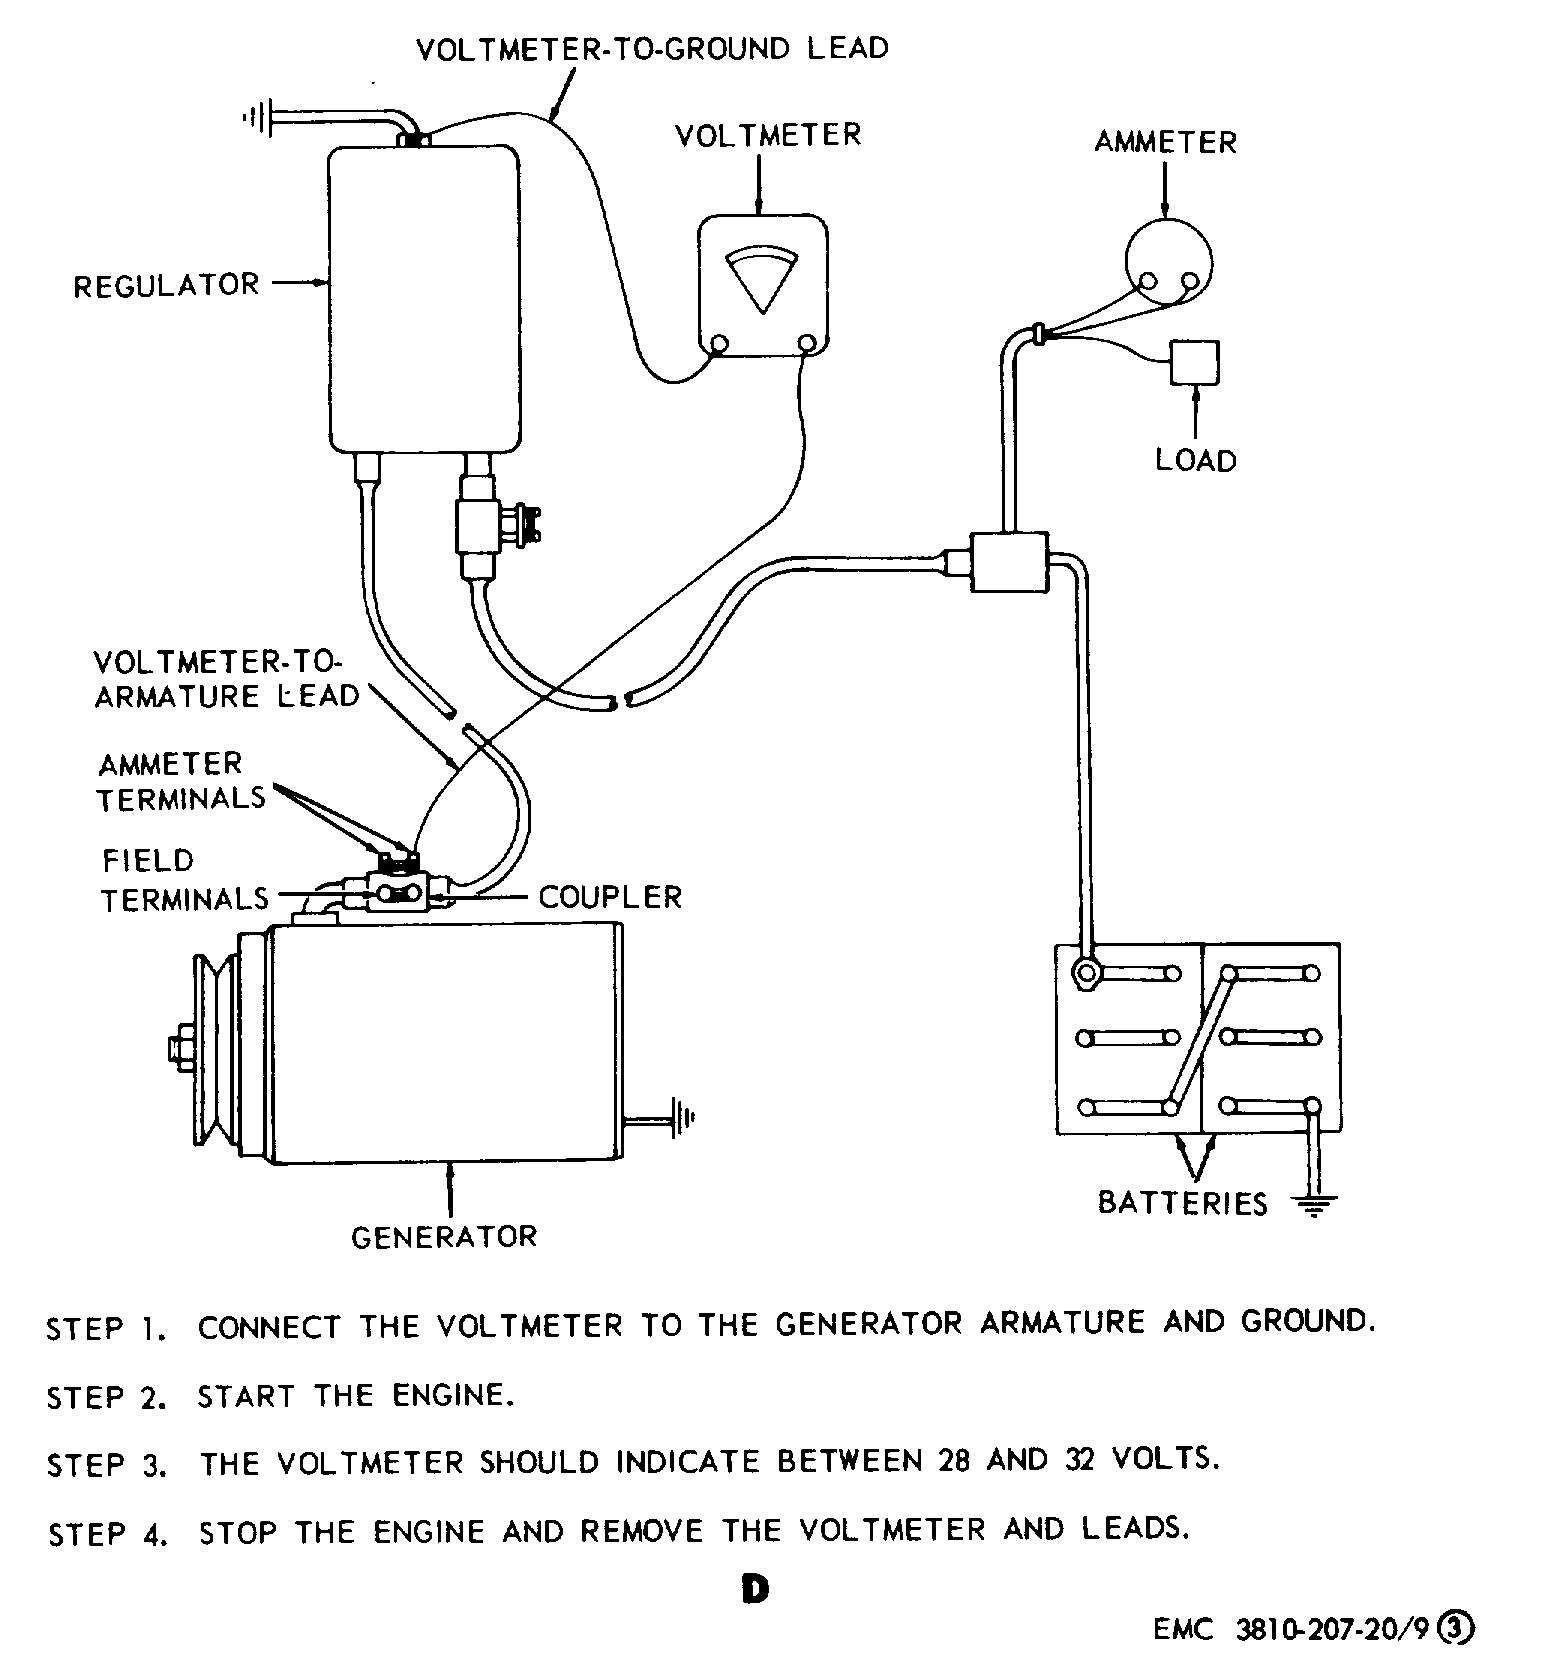 Wiring Diagram For Auto Gate Diagram Diagramtemplate Diagramsample Sistema Electrico Circuitos Electrica